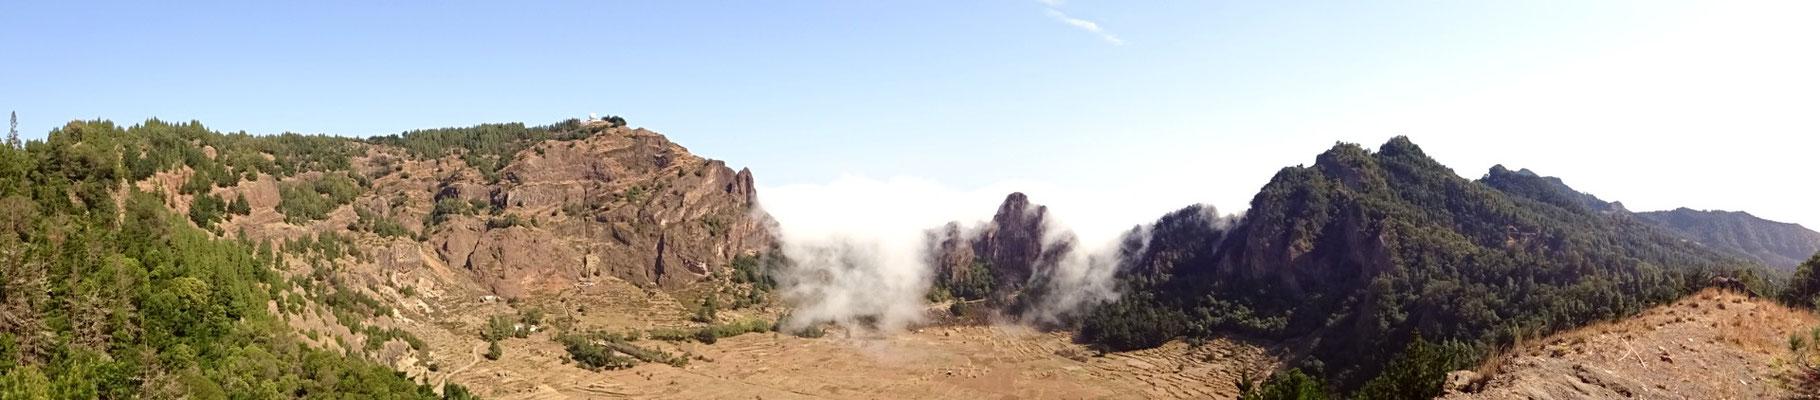 Panorama van de krater